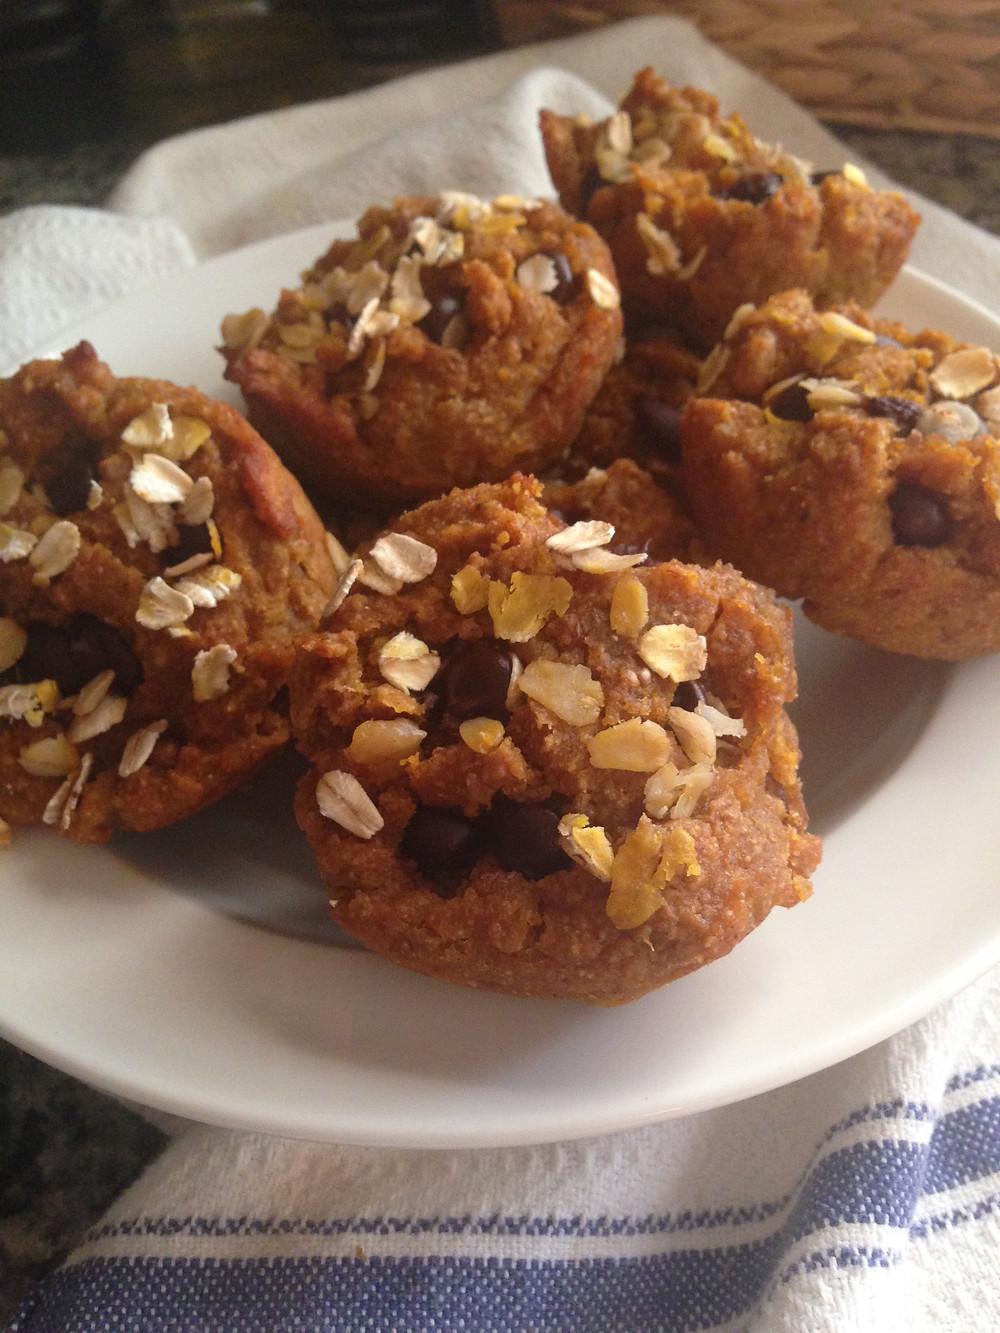 muffins, homemade, pumpkin, healthy, food, baking, nutrition